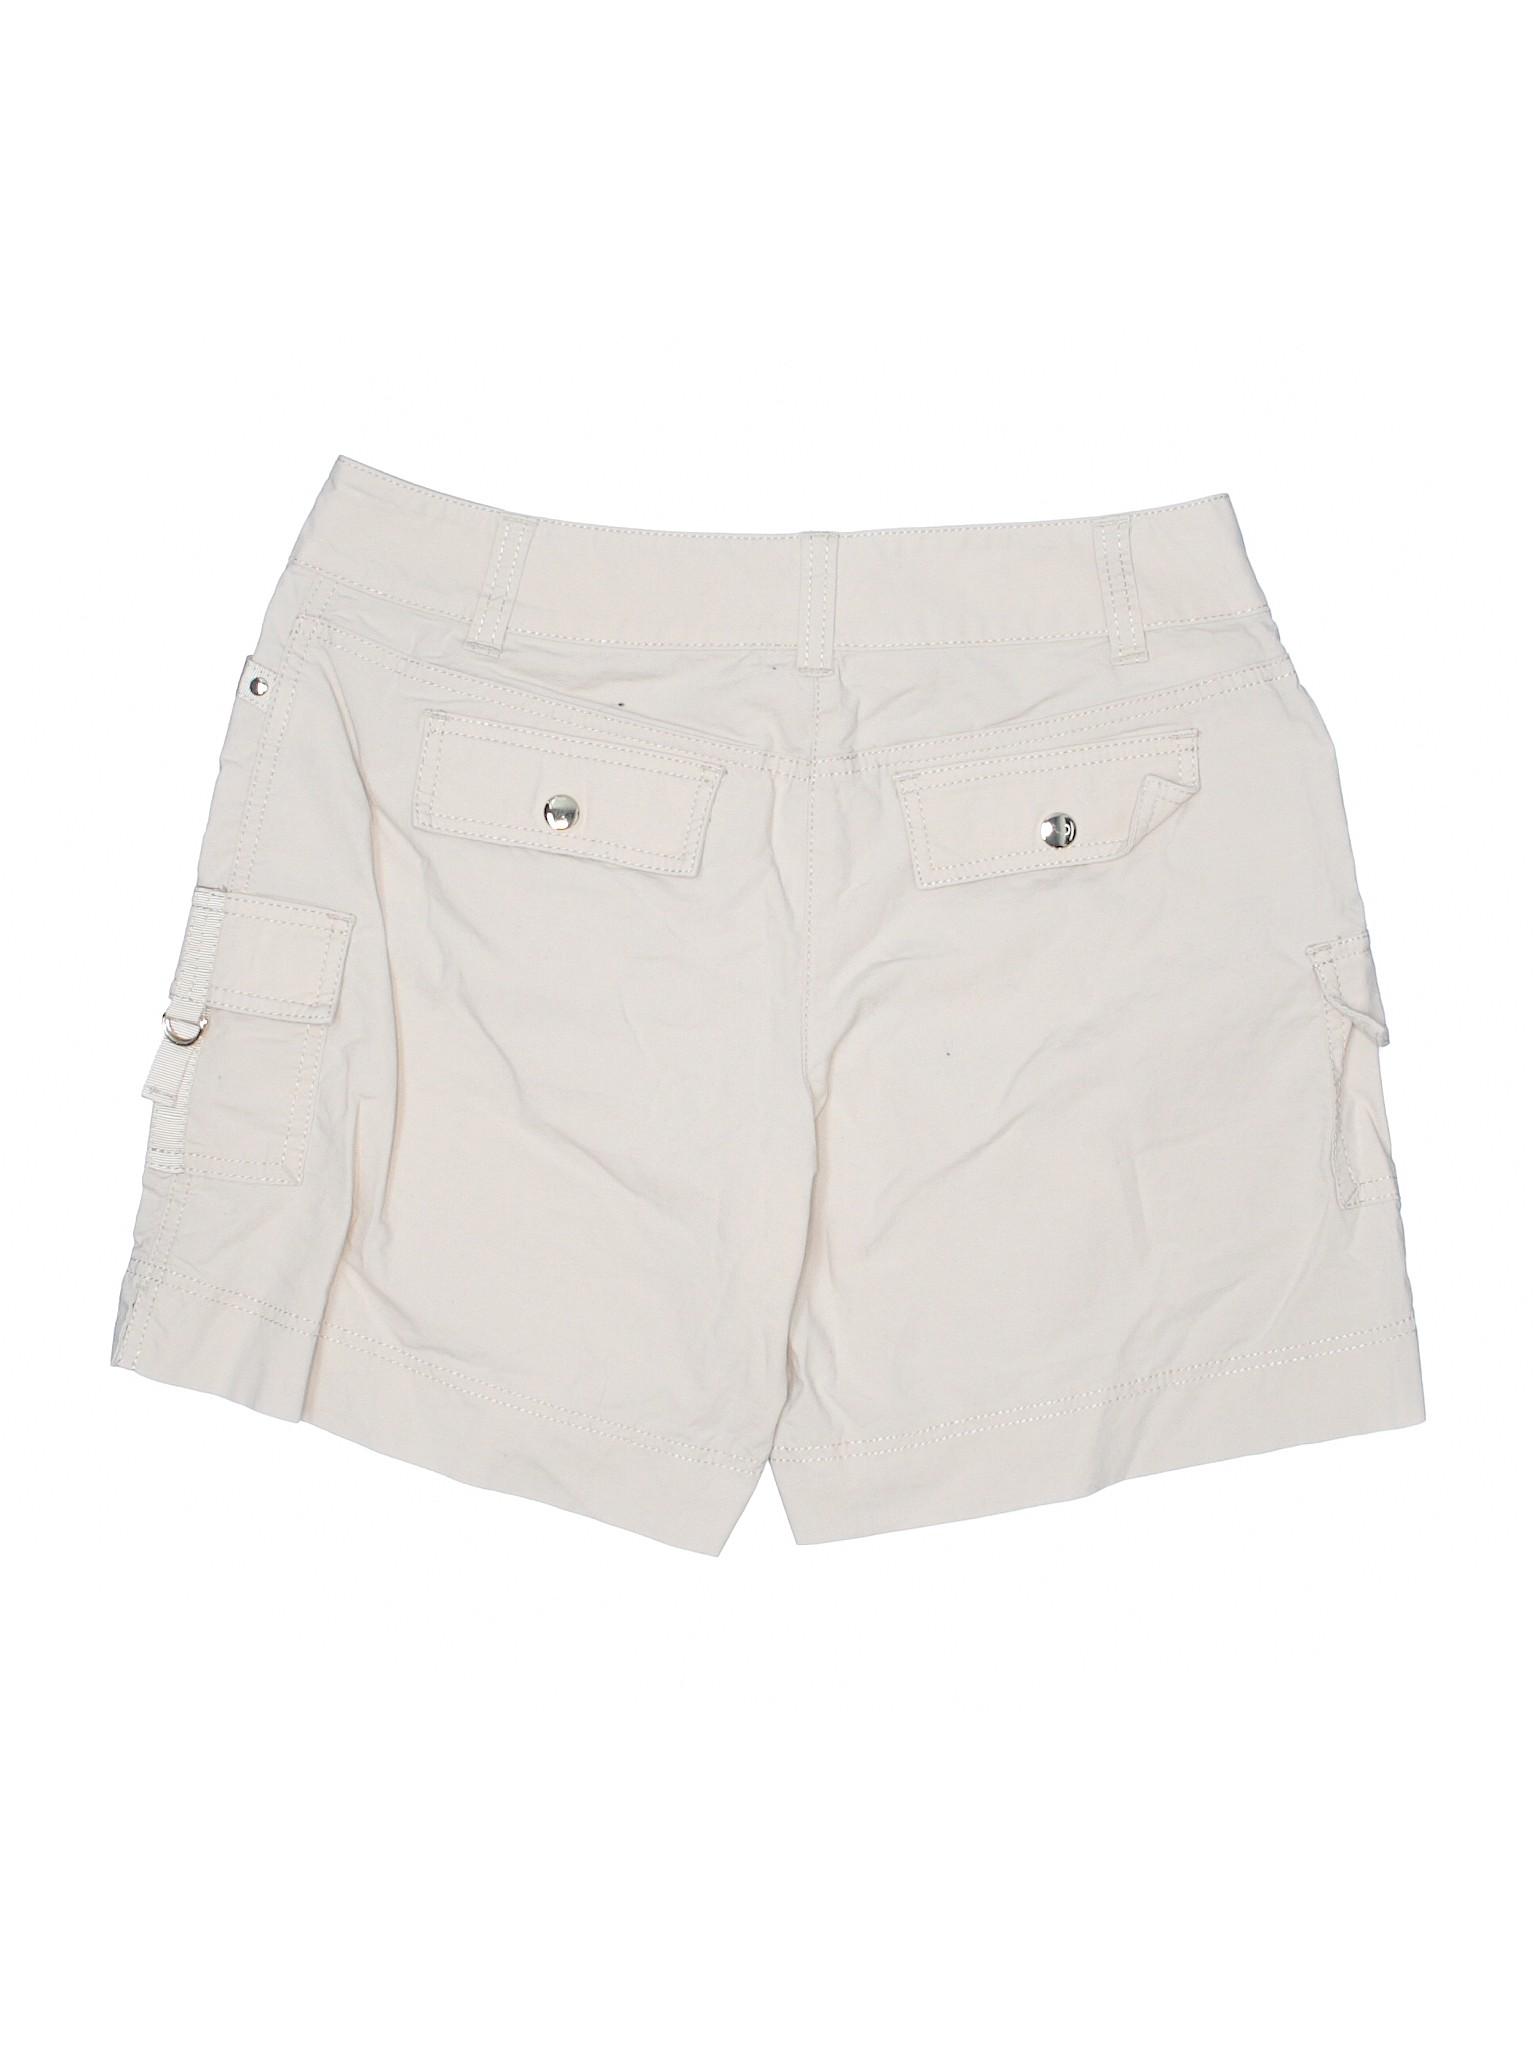 Boutique Shorts Black House White Market Cargo rq17rwT